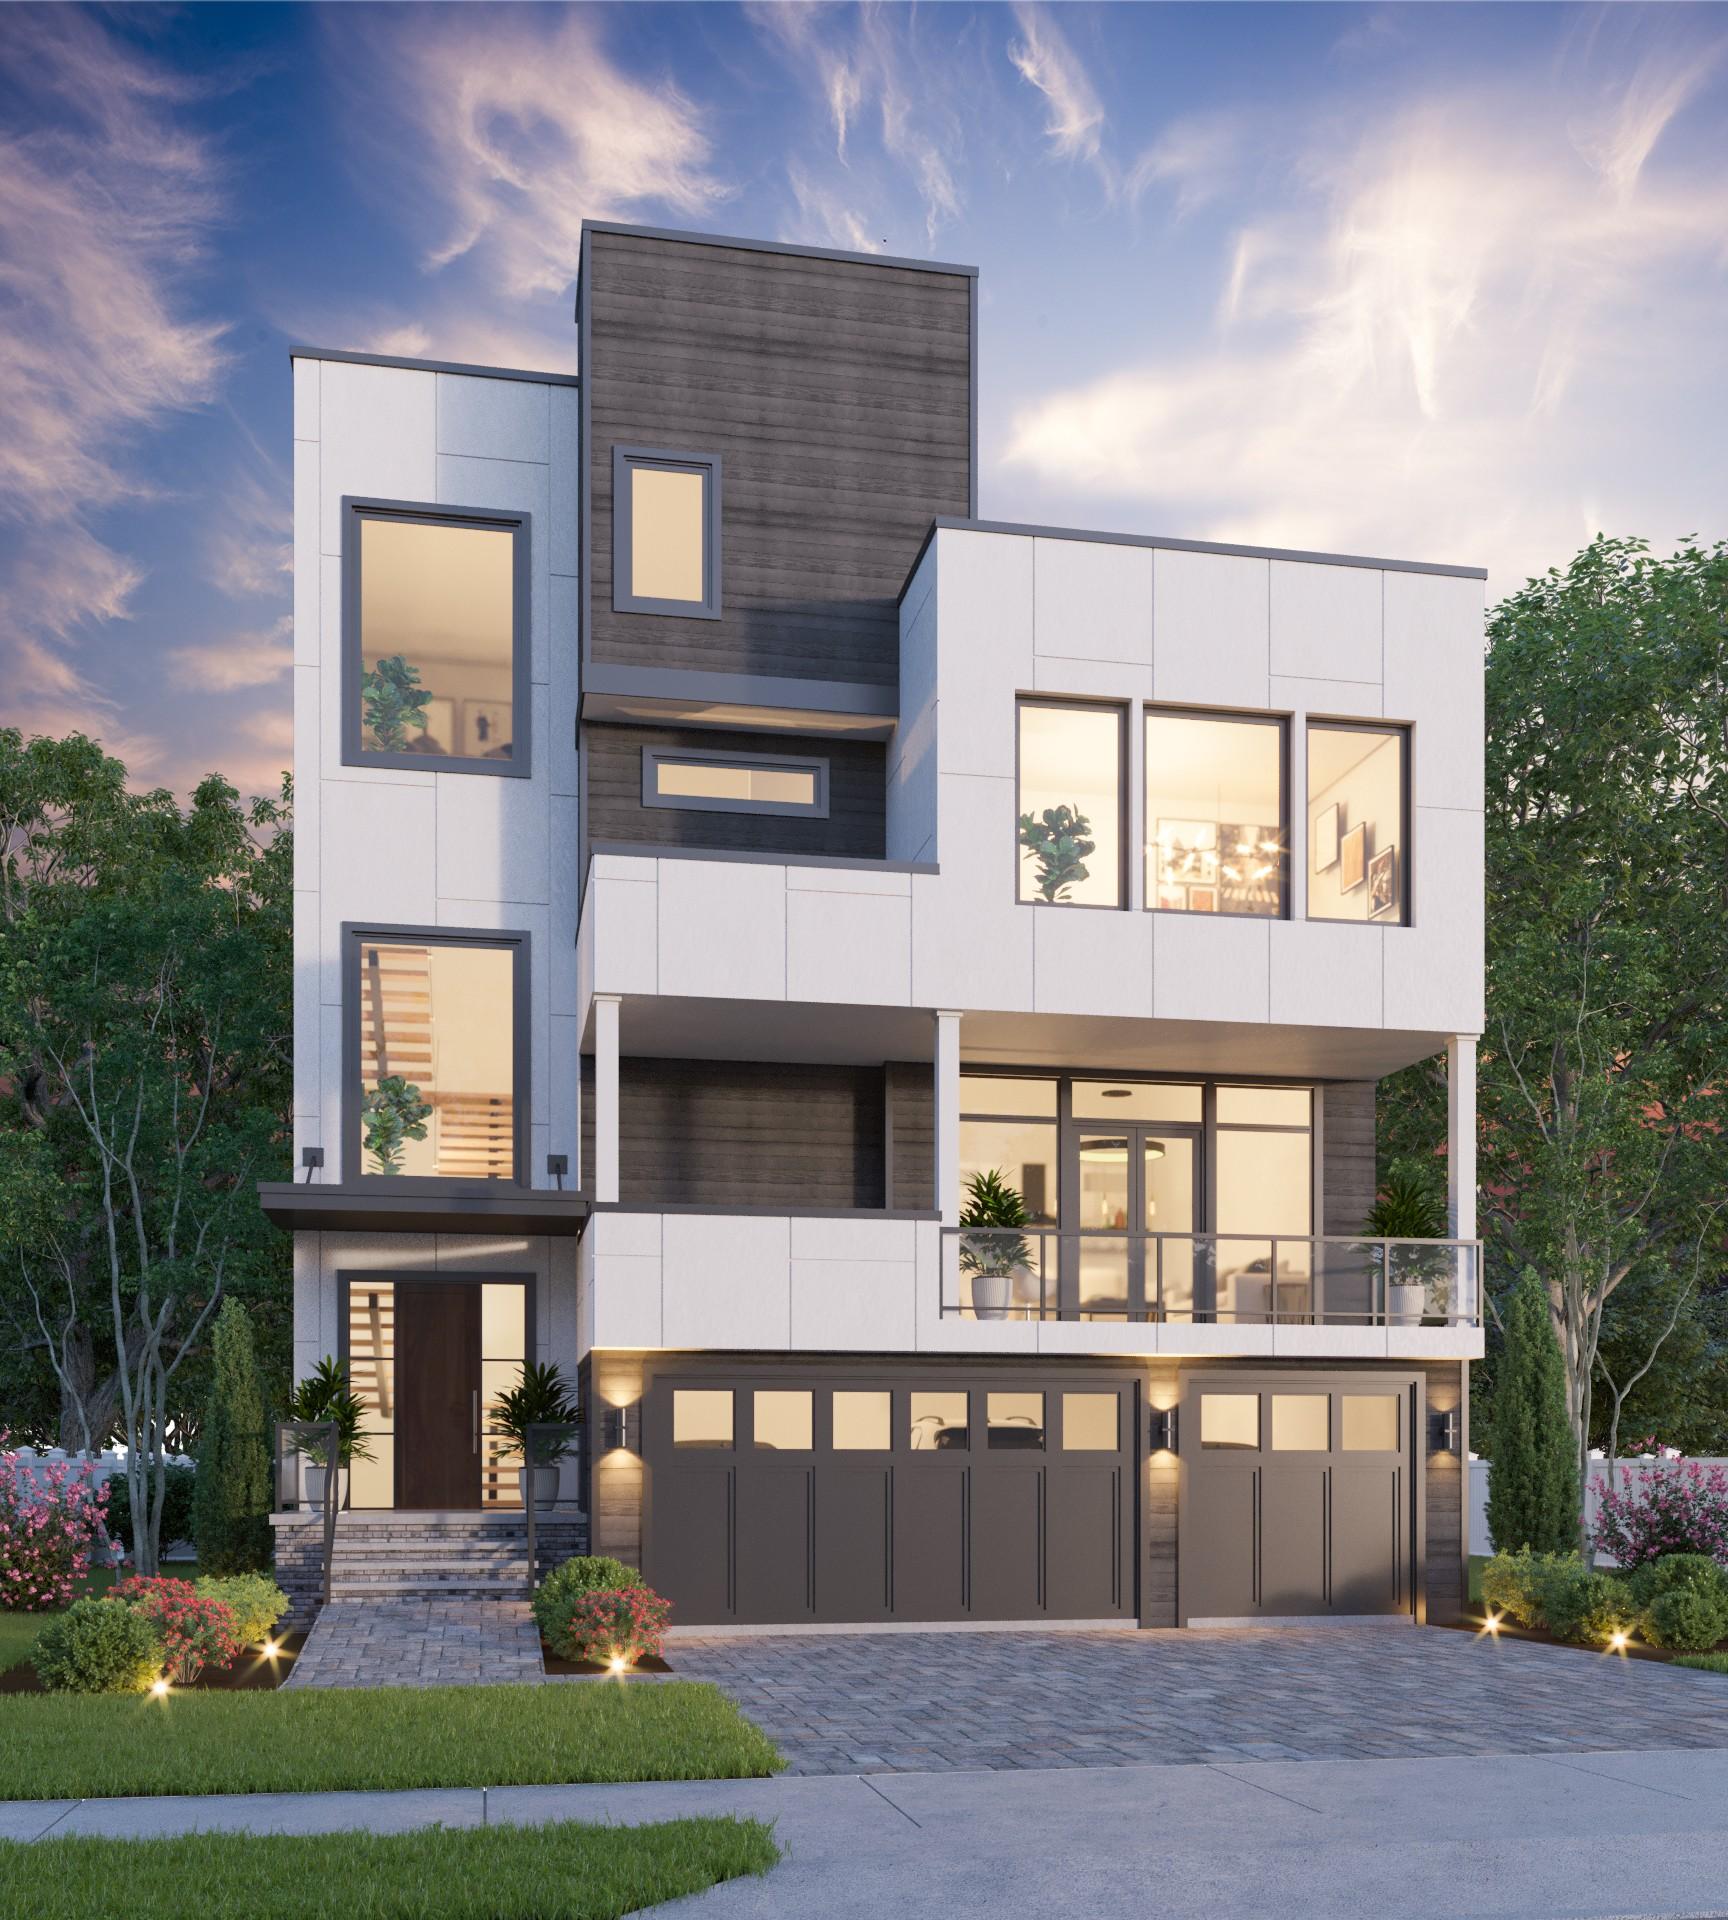 1000B 9th Ave, S Property Photo - Nashville, TN real estate listing